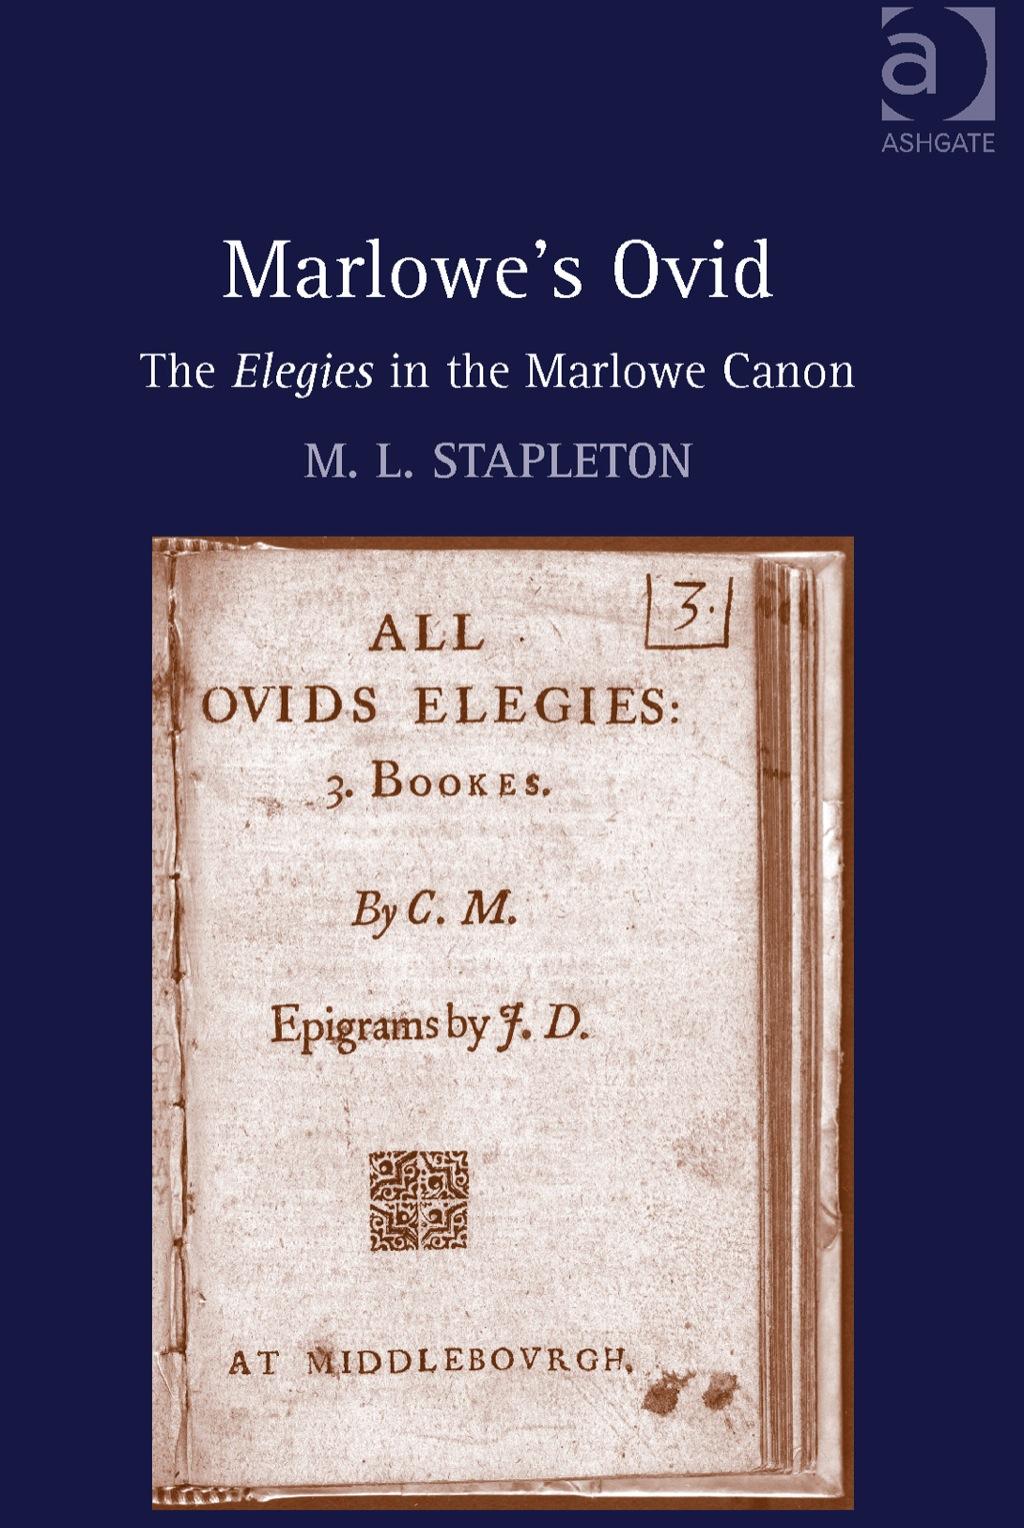 Marlowe's Ovid: The Elegies in the Marlowe Canon (eBook Rental)